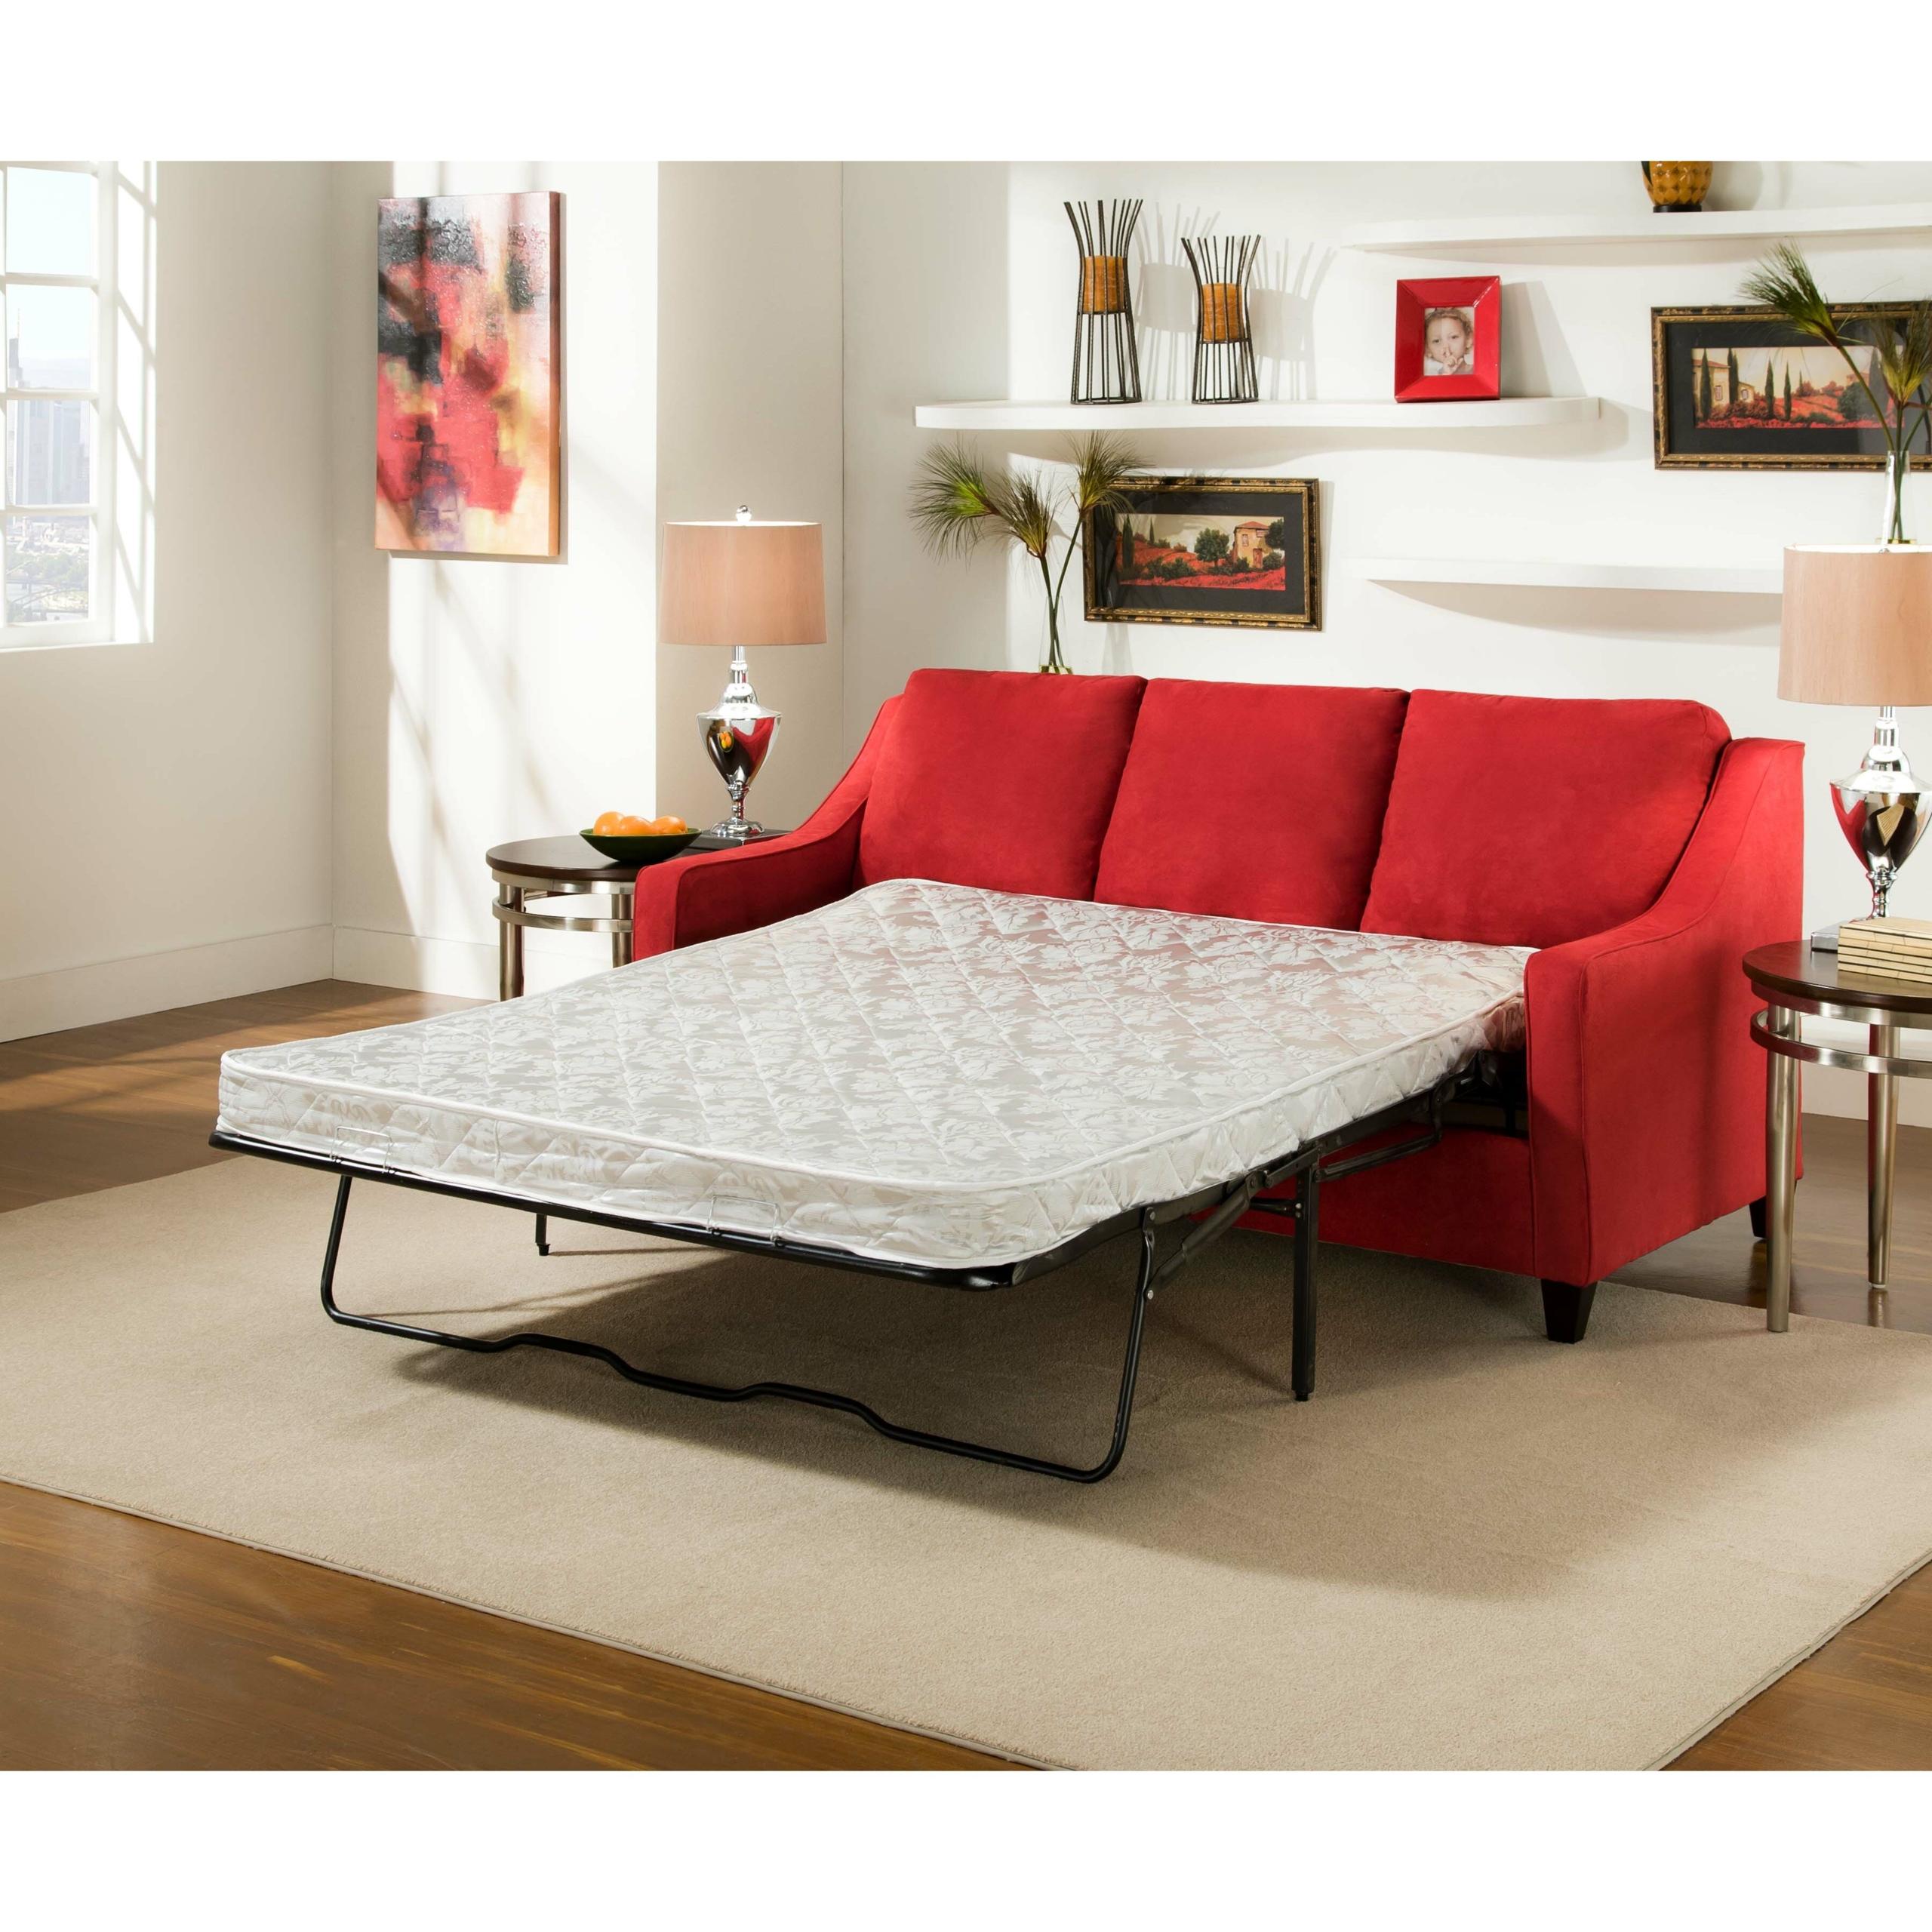 simmons sofa sleeper ideas on foter rh foter com